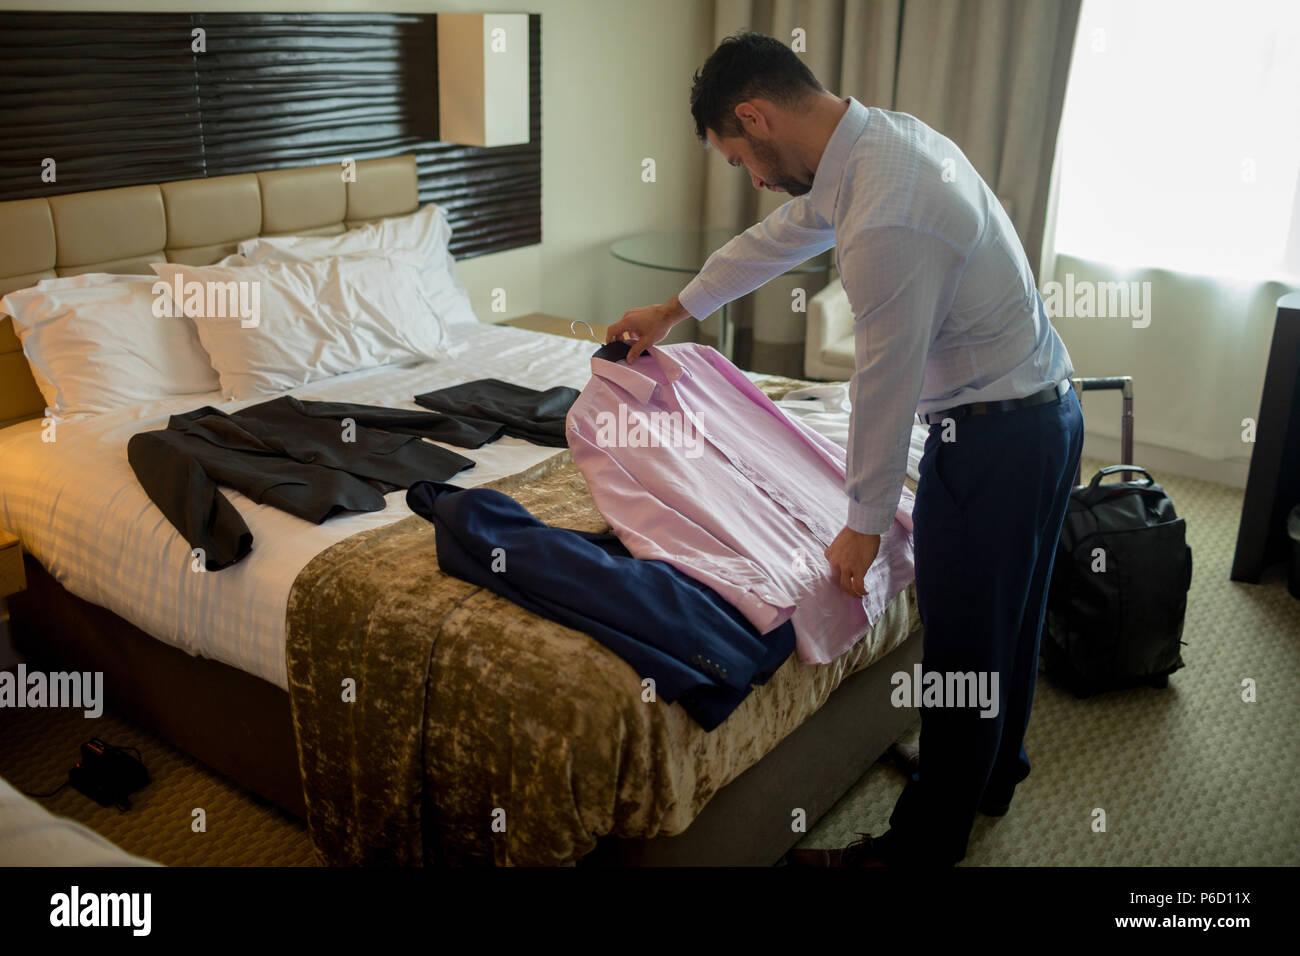 Geschäftsmann Verpackung Kleidung auf dem Bett Stockbild